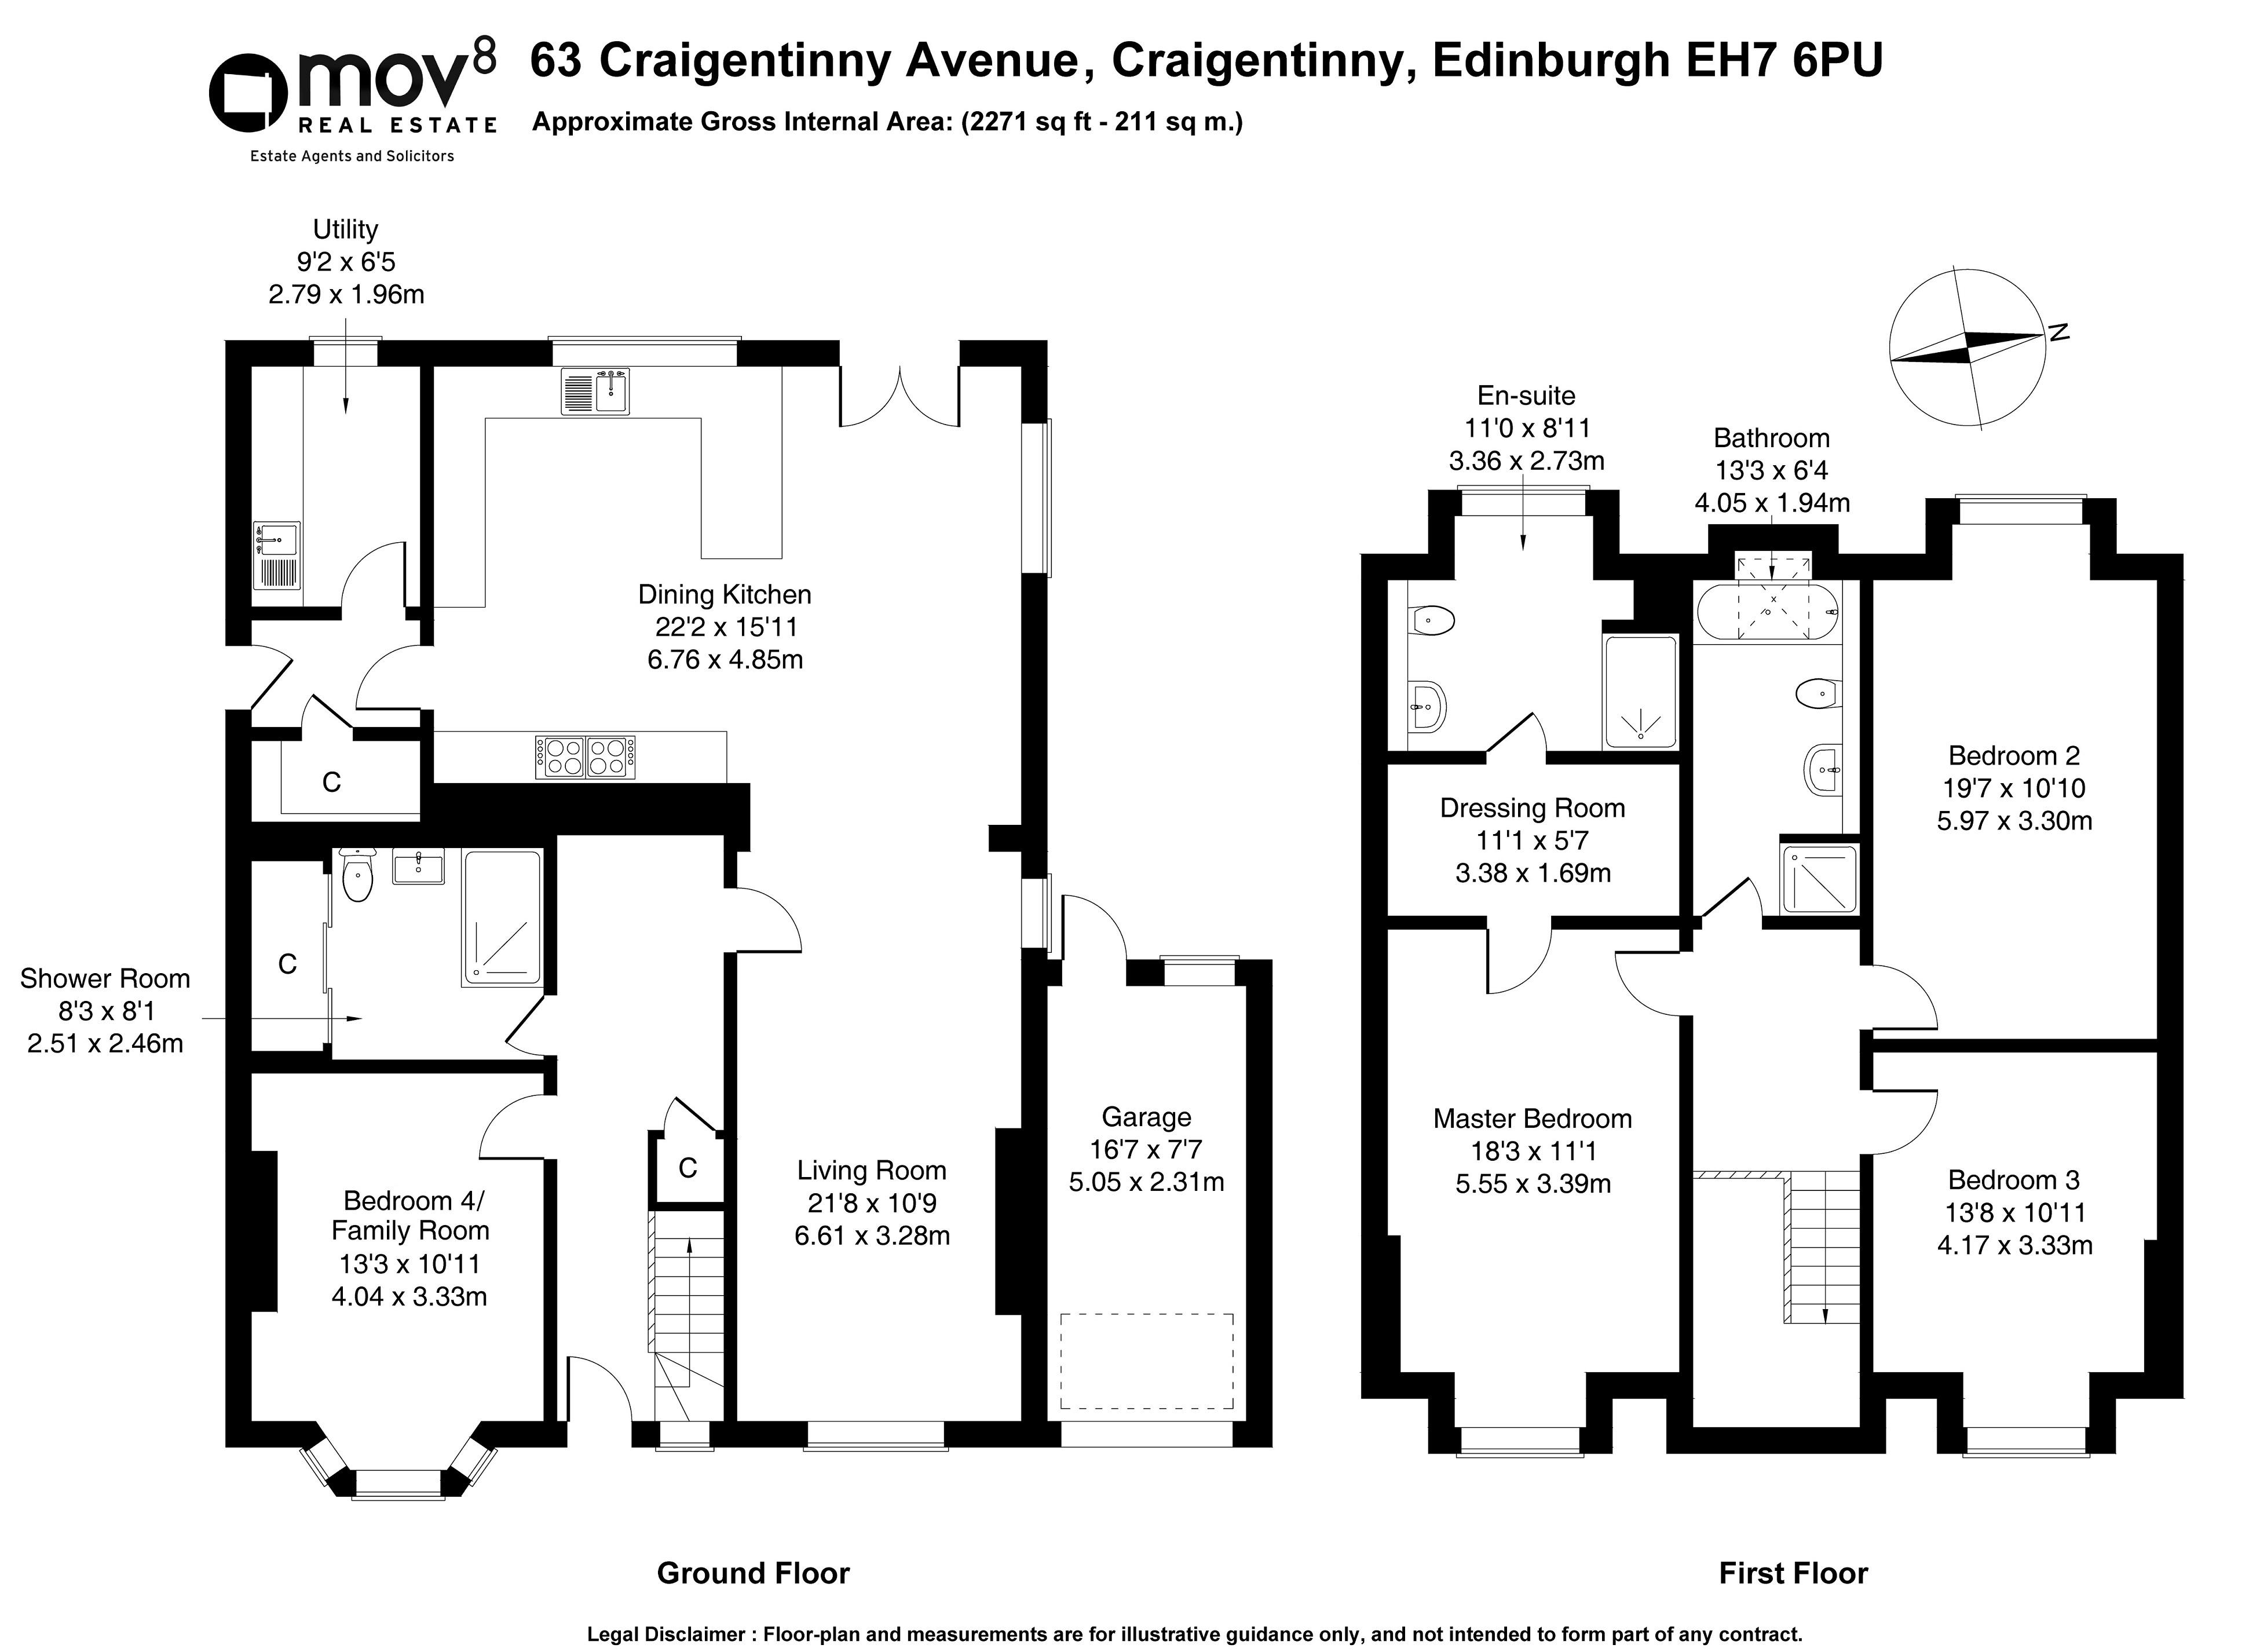 Floorplan 1 of 63 Craigentinny Avenue, Craigentinny, Edinburgh, EH7 6PU